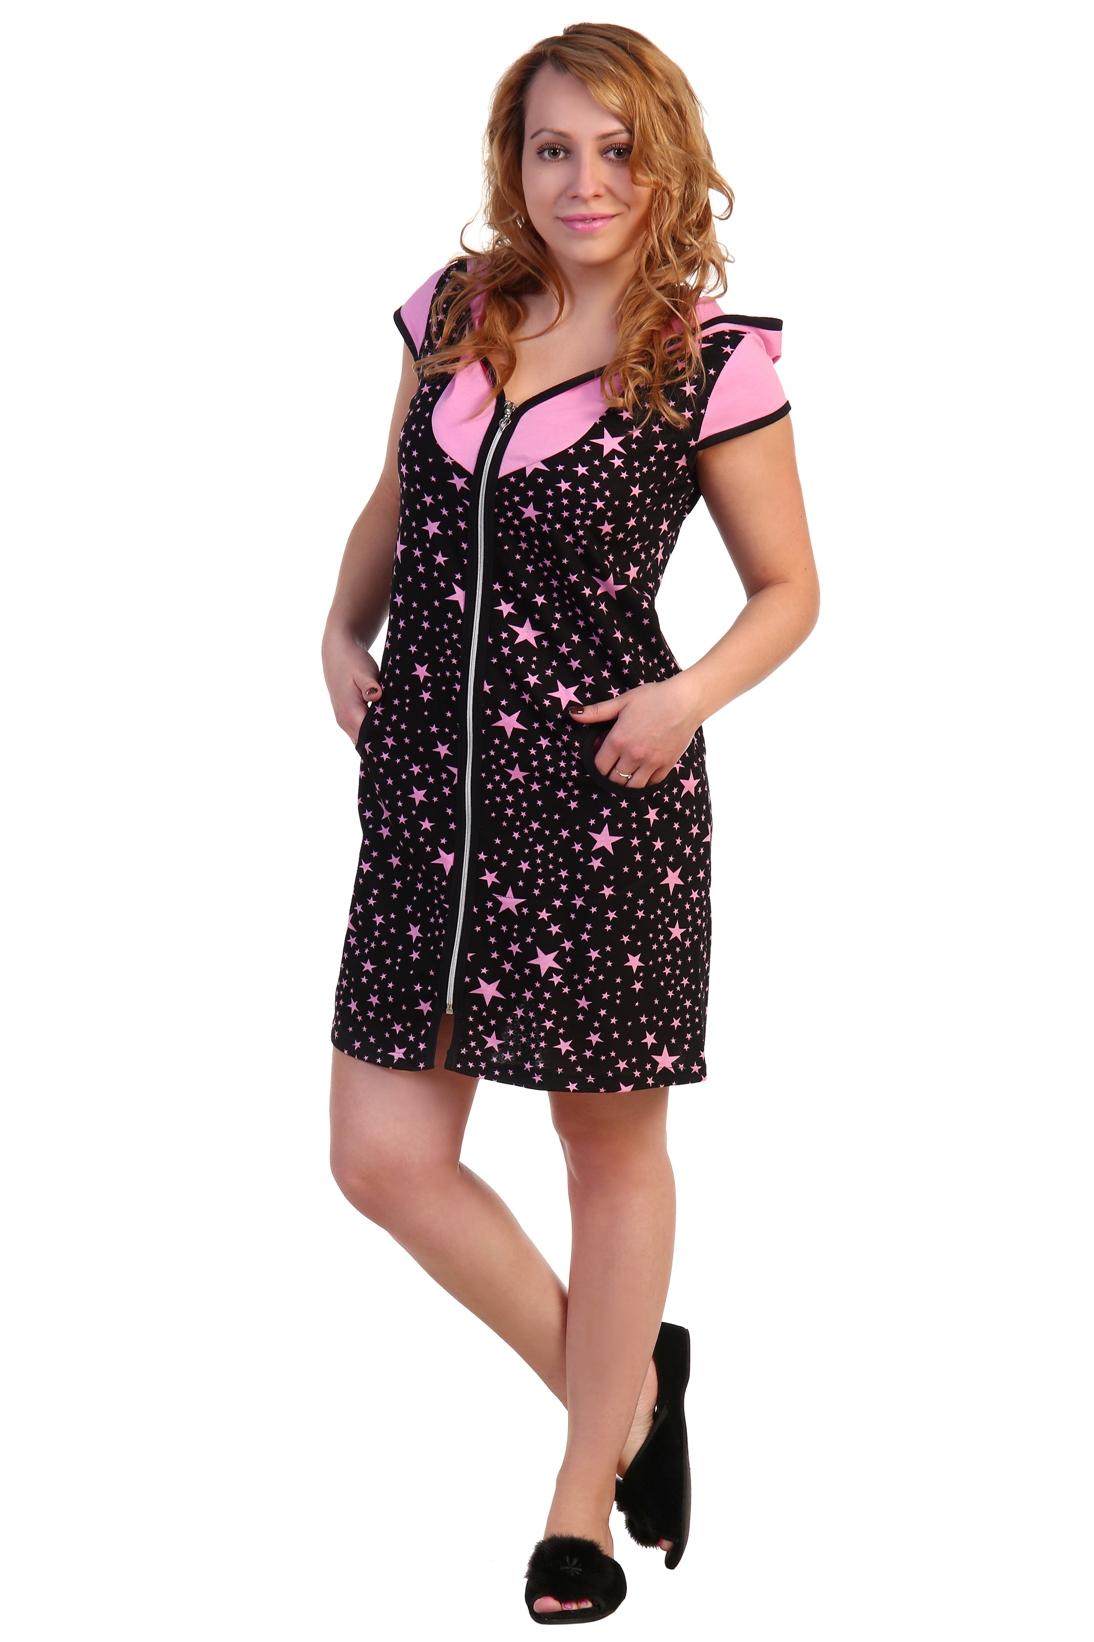 Жен. халат арт. 16-0278 Розовый р. 54 - Женская одежда артикул: 30425